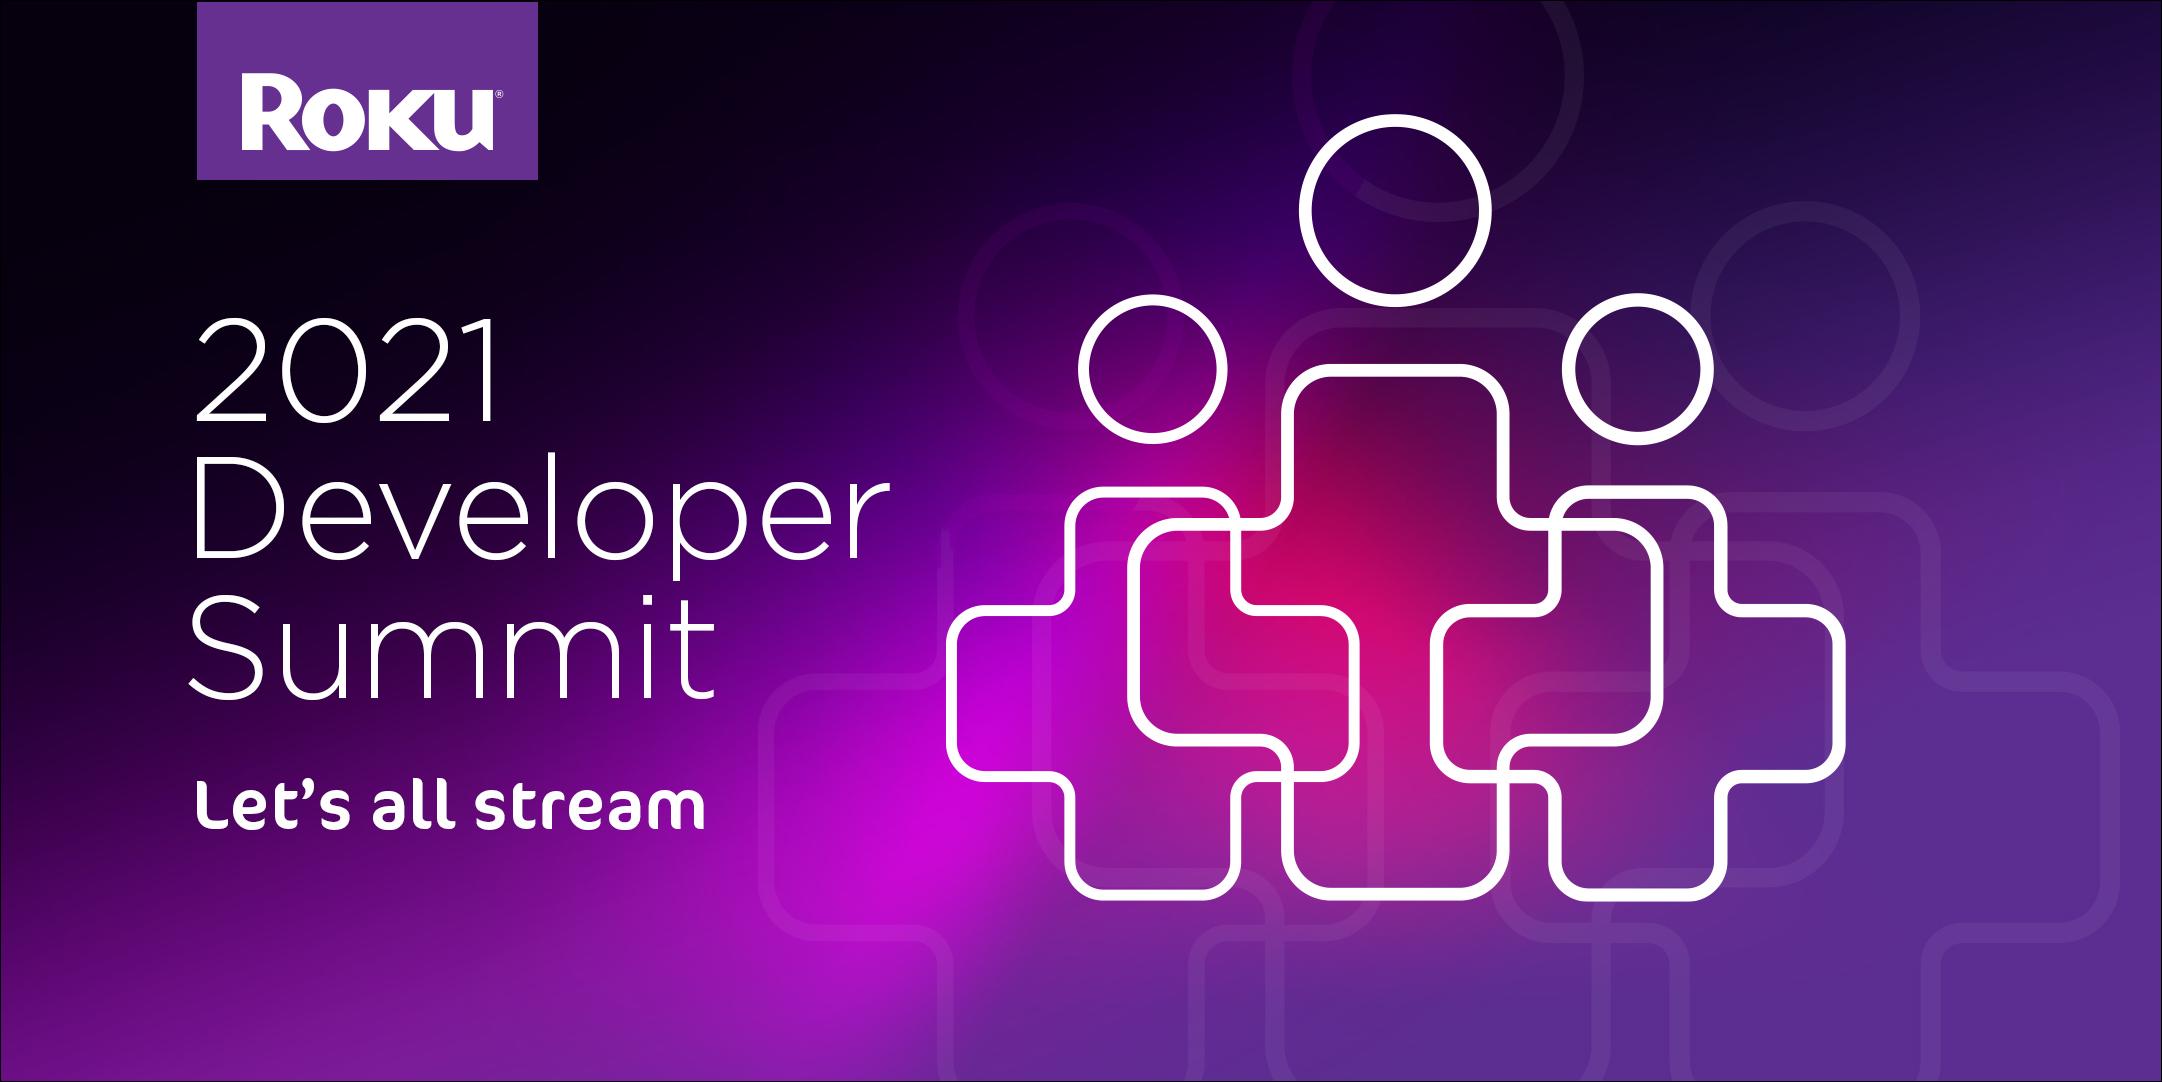 Roku Developer Summit 2021 - Let's all stream